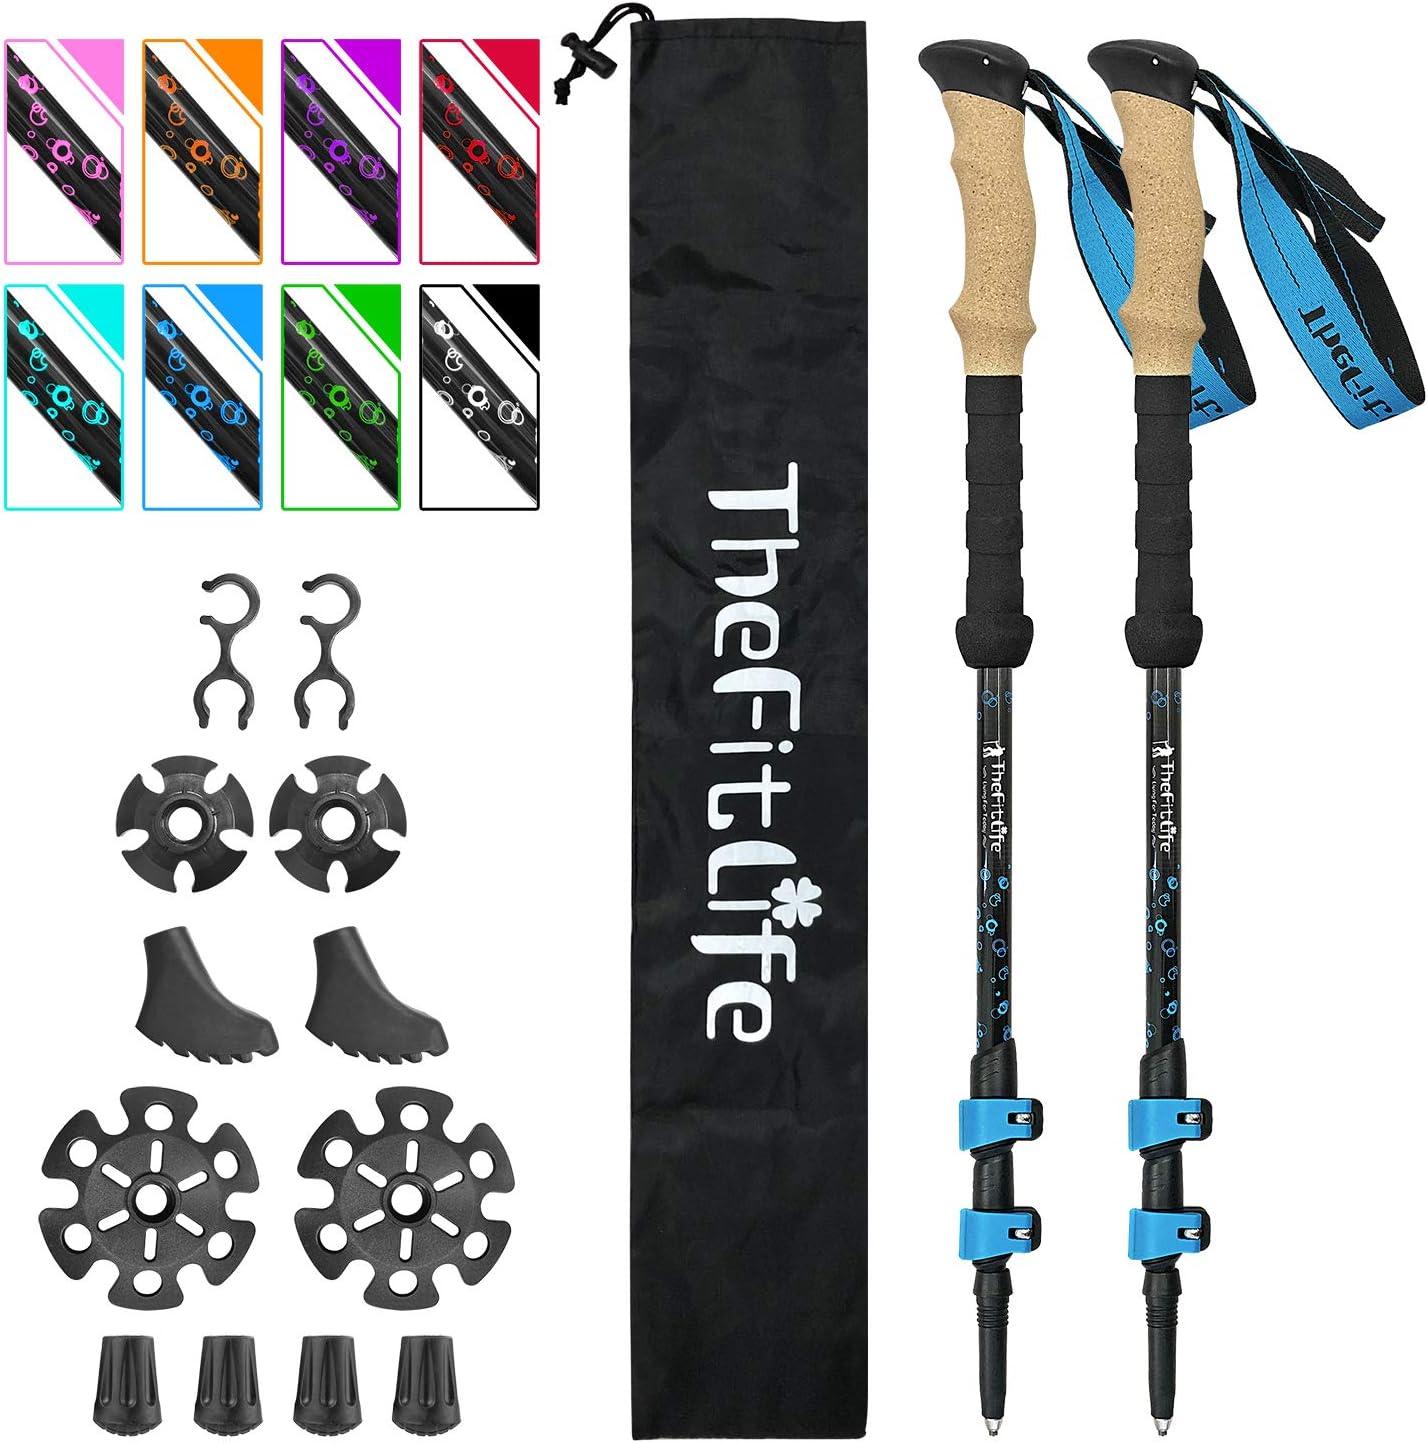 1//2Pcs Carbon Fiber Trekking Pole Walking Hiking Stick Adjustable Cane 55-125cm